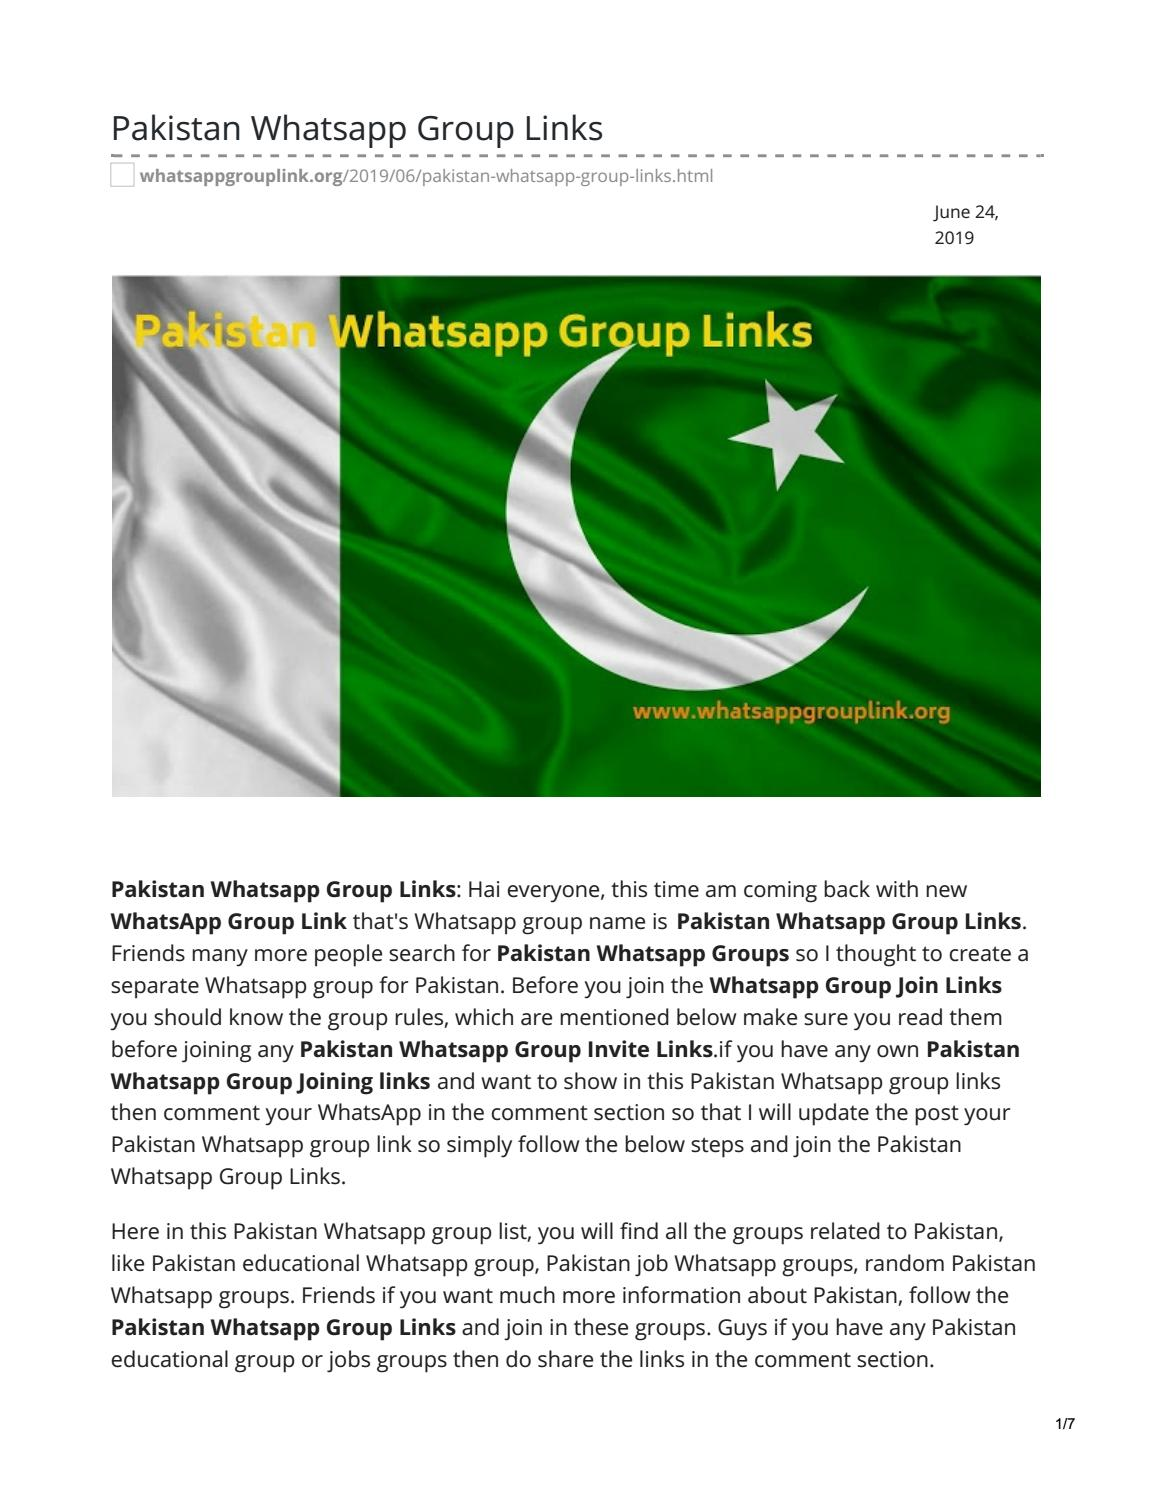 Political Whatsapp Group Links by whatsappgrouplinks77 - issuu